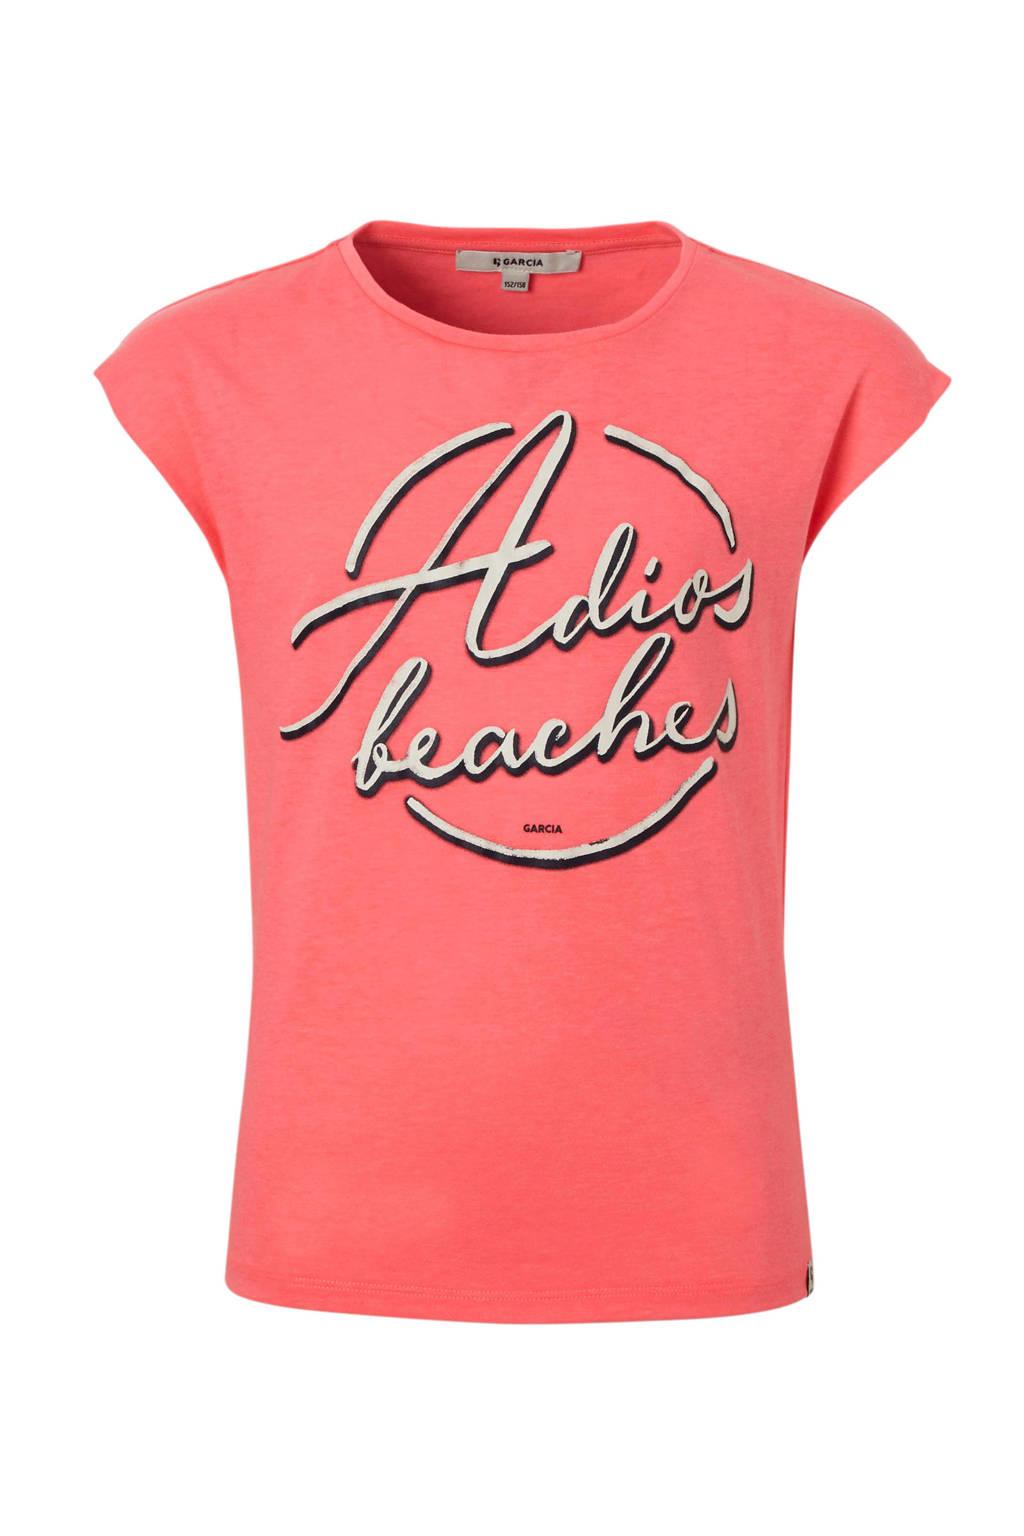 81cd4a96b1781f Garcia T-shirt met tekst roze   wehkamp